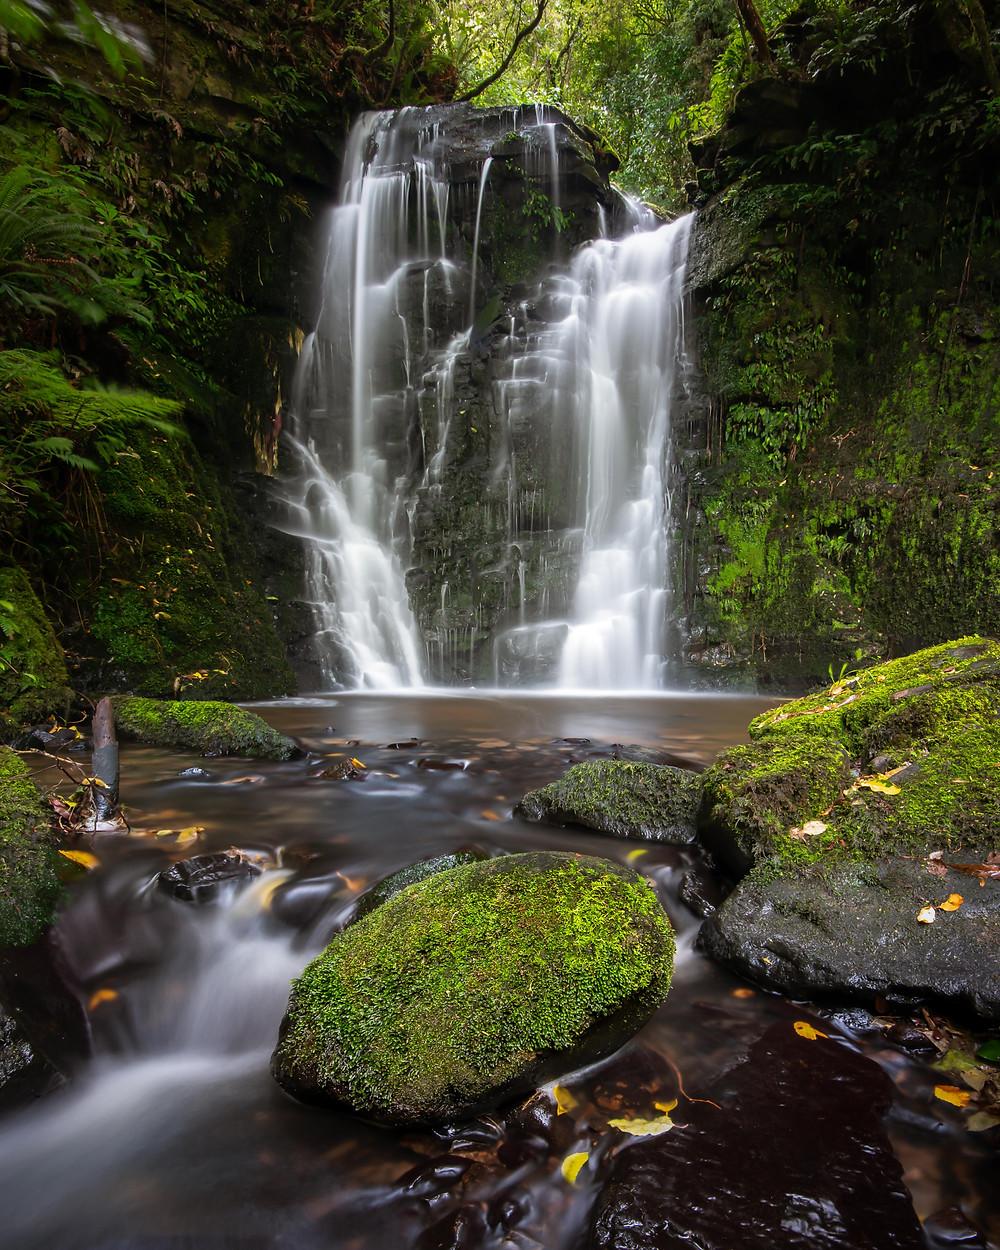 Matai Falls Waterfall the Catlins New Zealand NZ